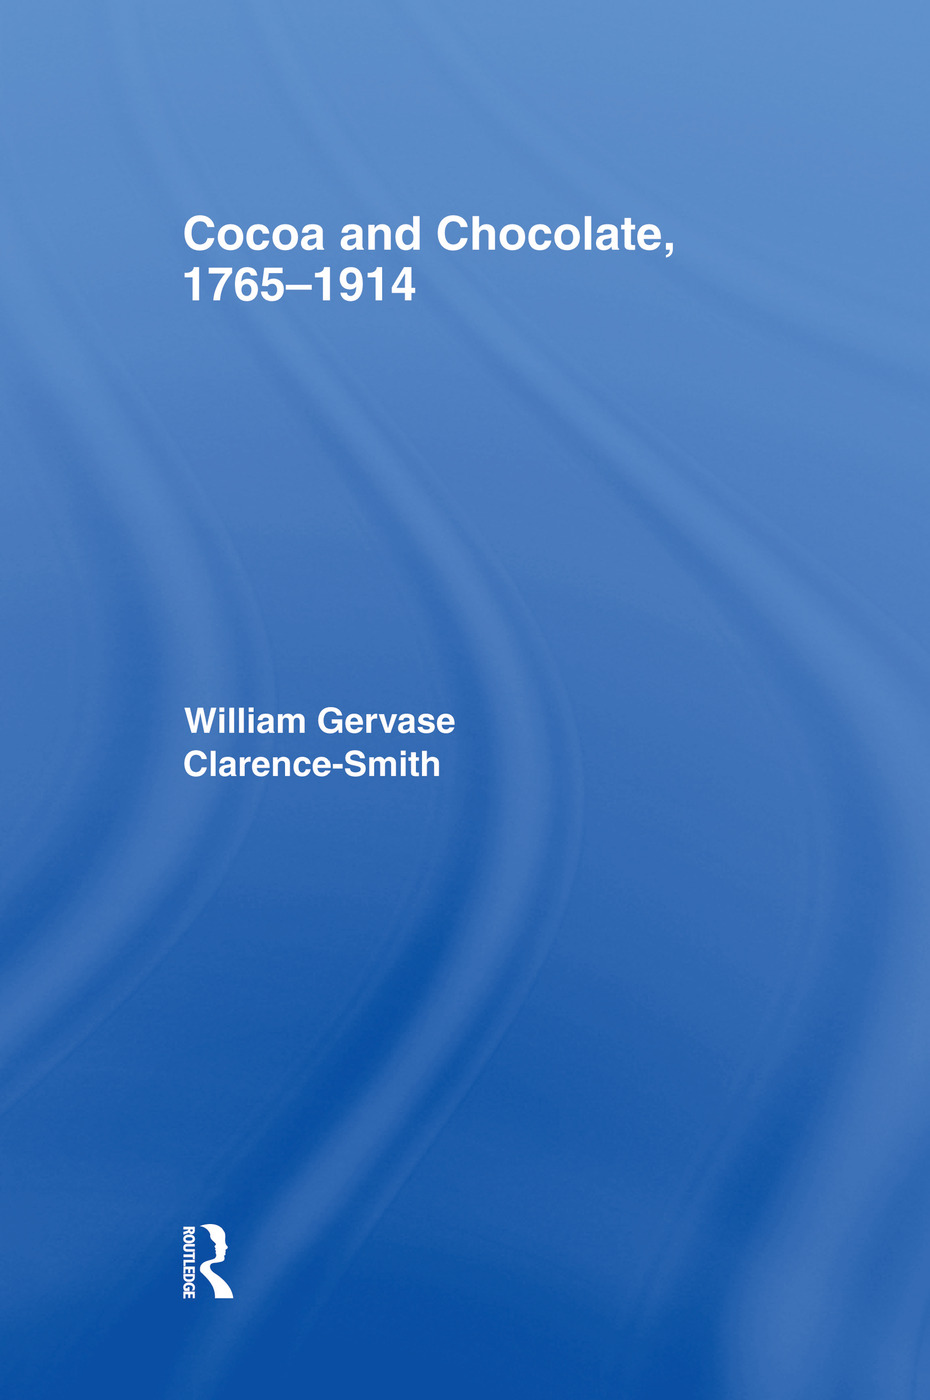 Cocoa and Chocolate, 1765-1914